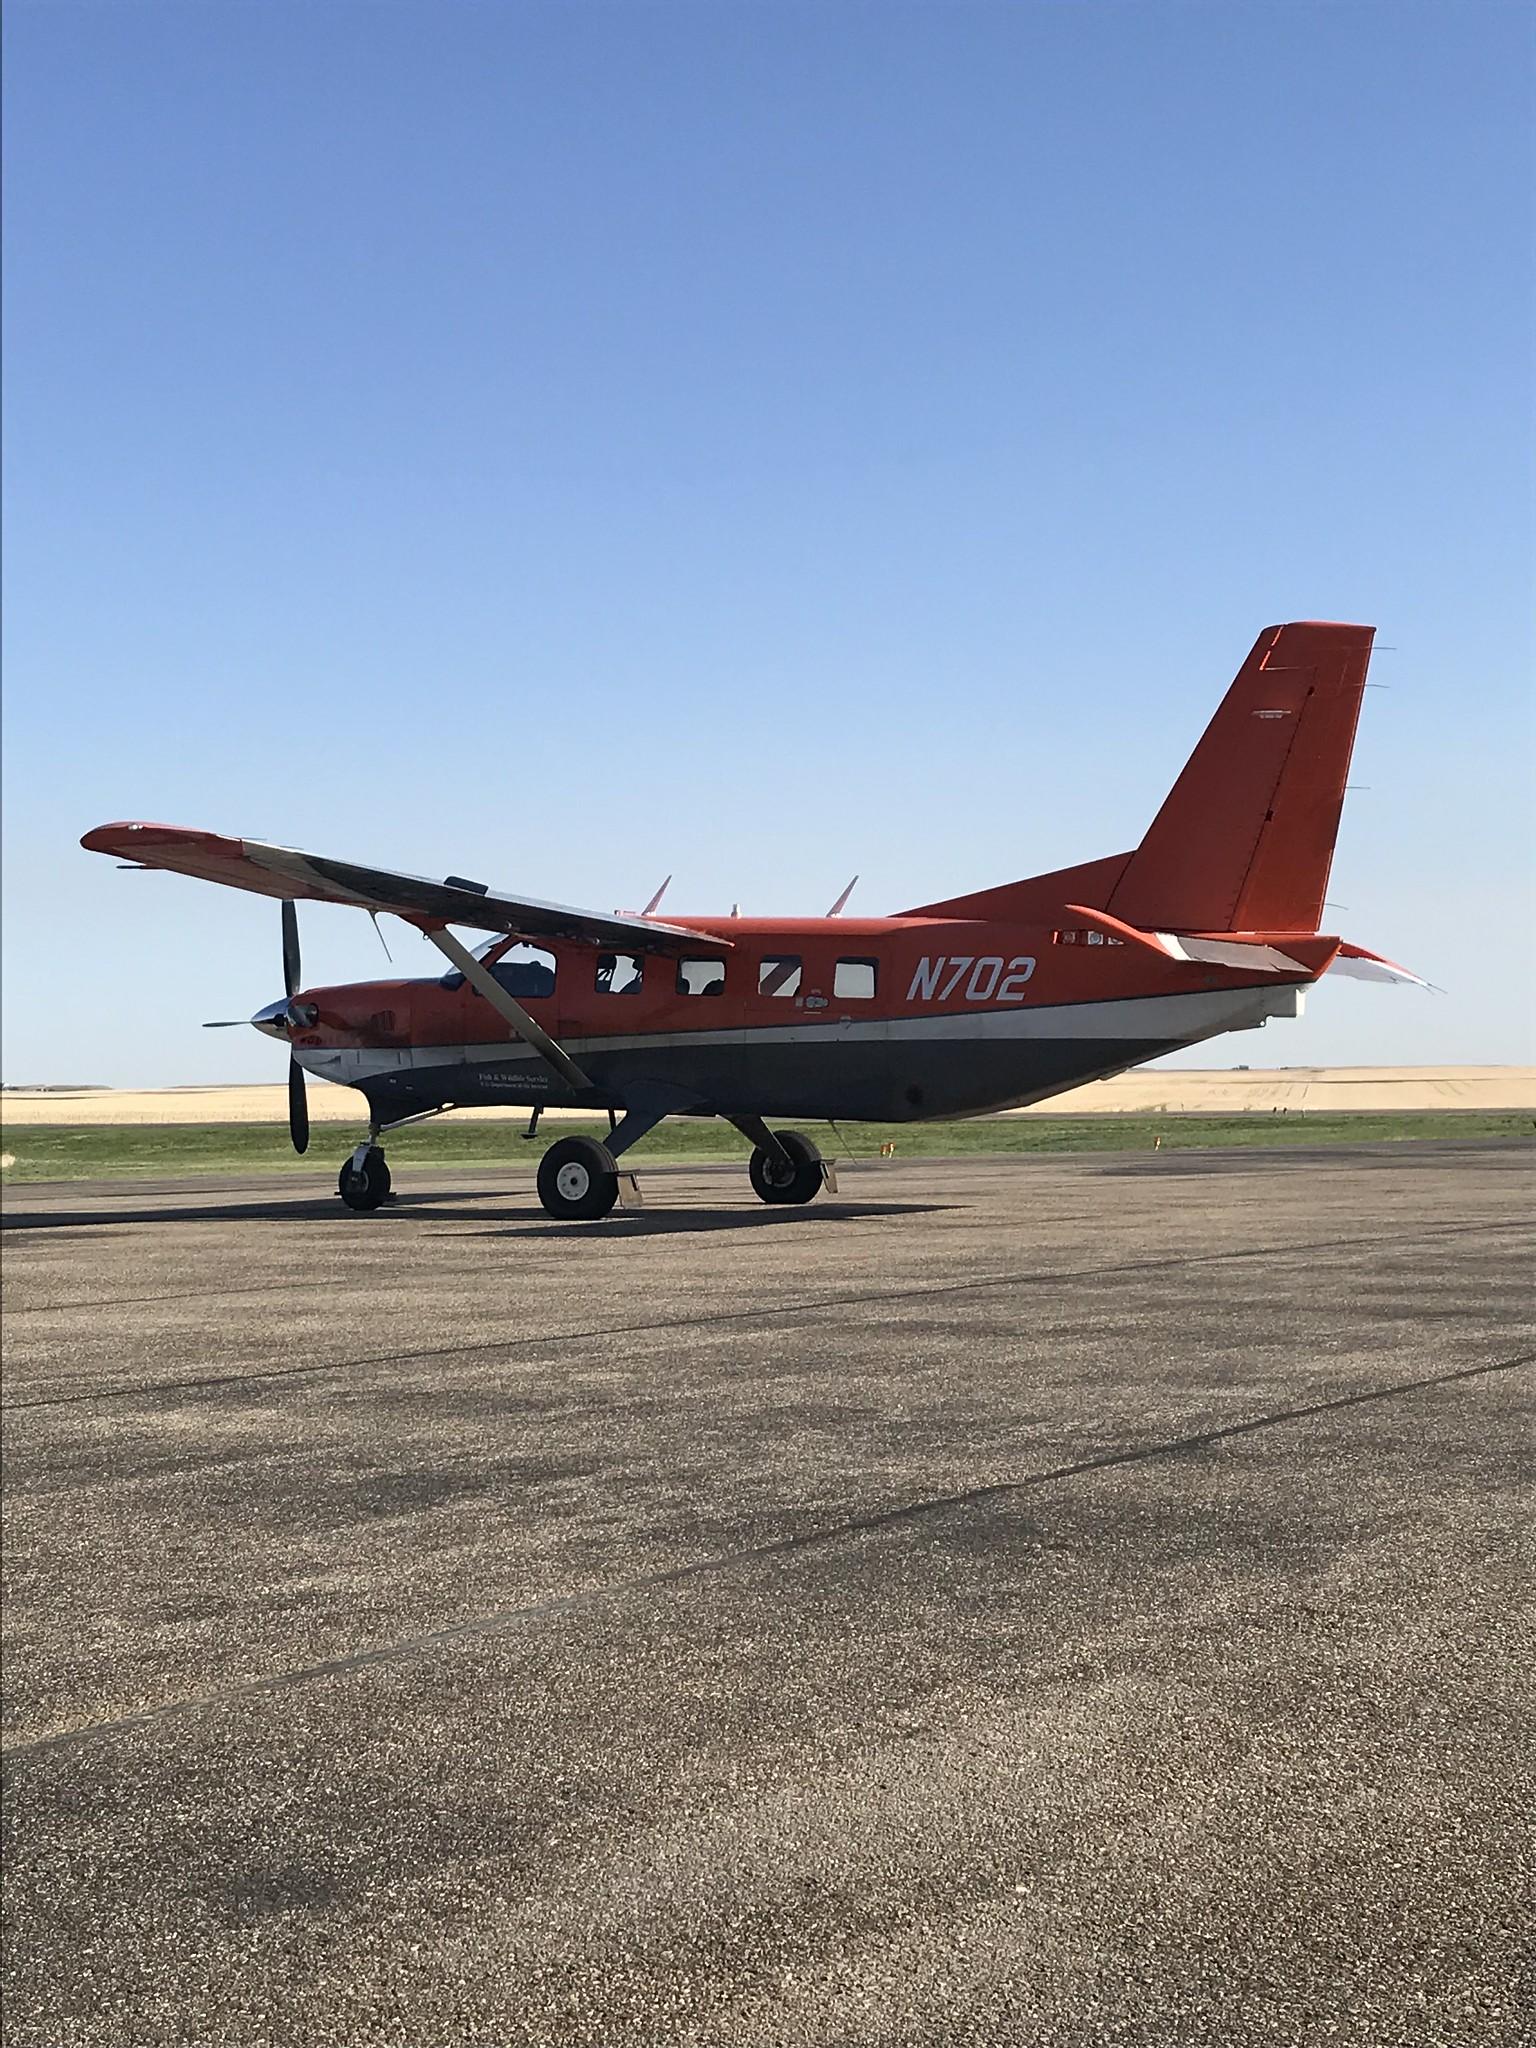 Kodiak N702 Leader, SK USFWS